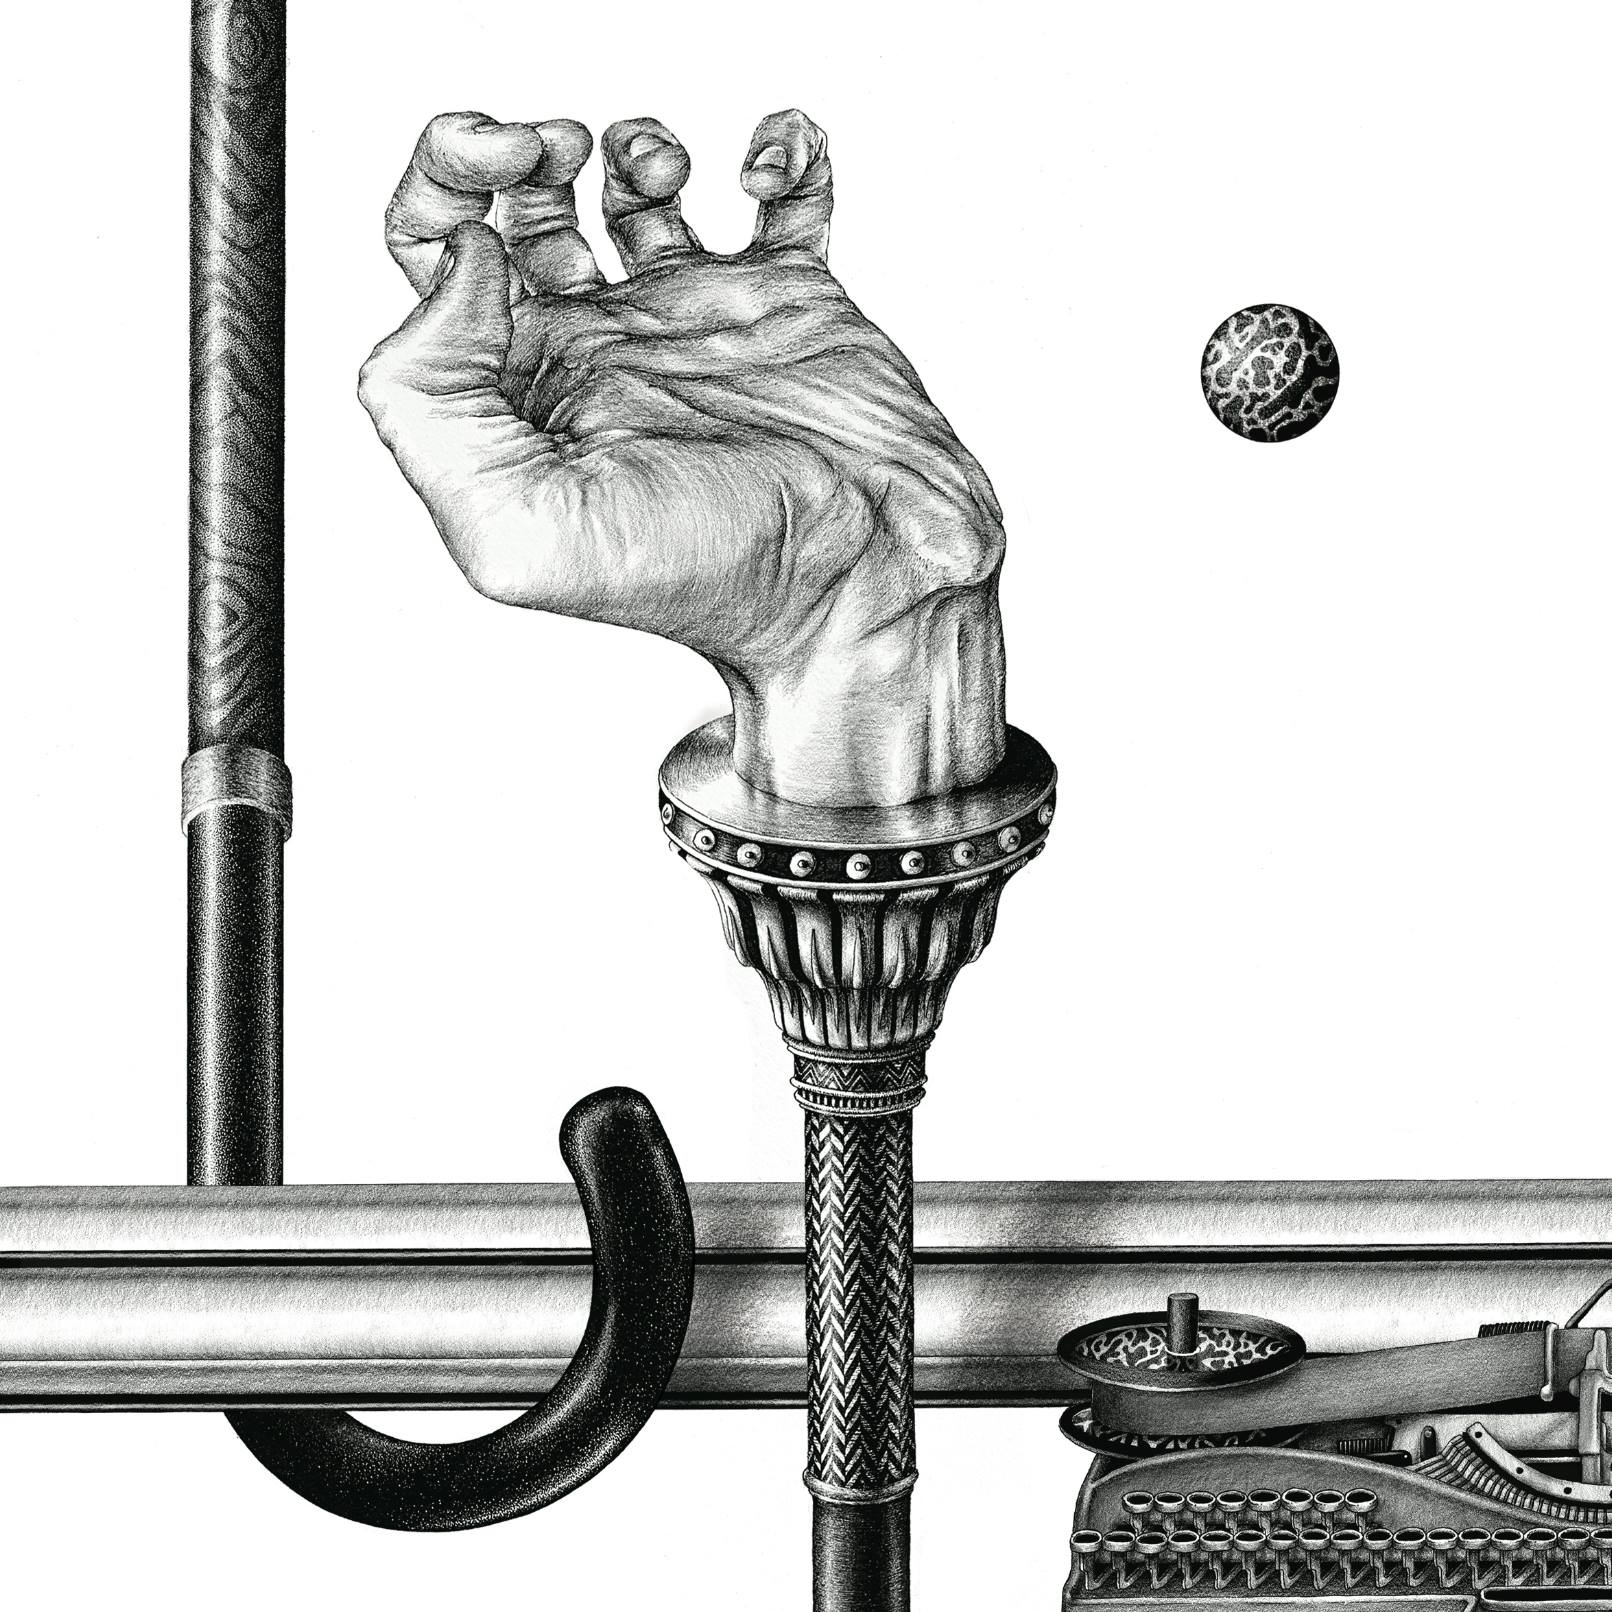 Ugo Gattoni Hermes walking sticks illustration projet dessin draw-6